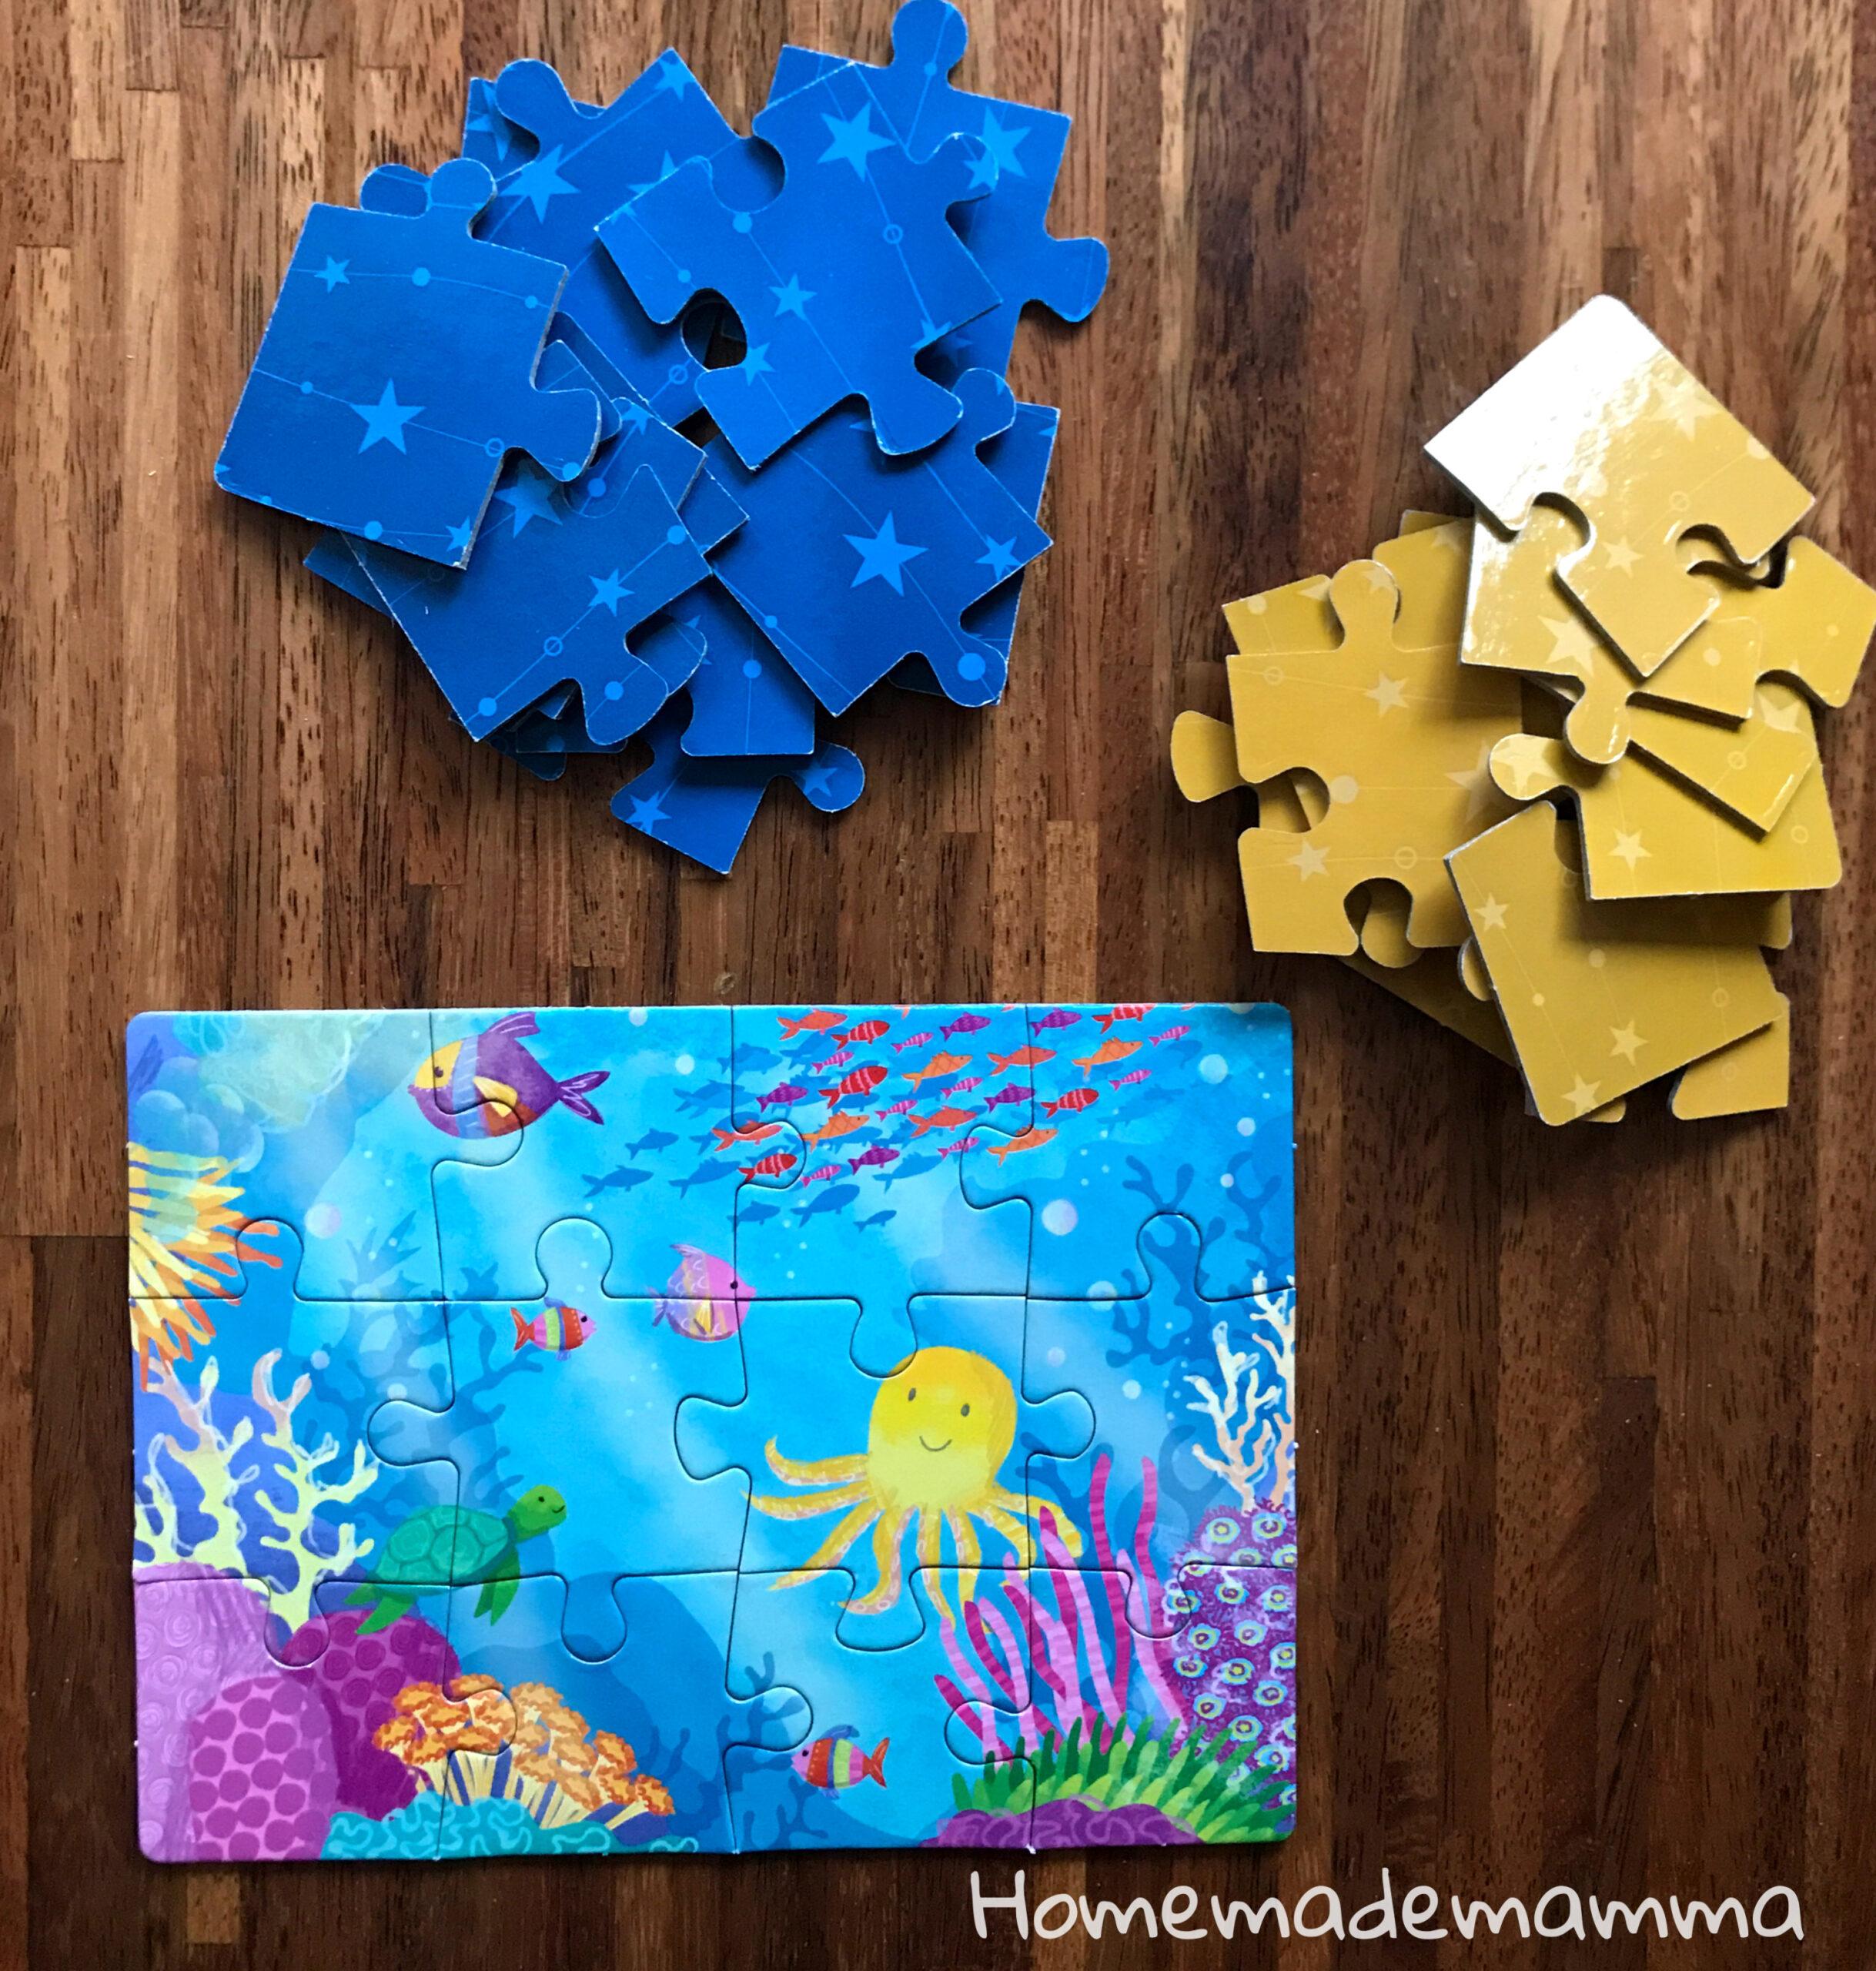 nventastorie headu gioco per bimbi inventare storie piccoli creatività e fantasia